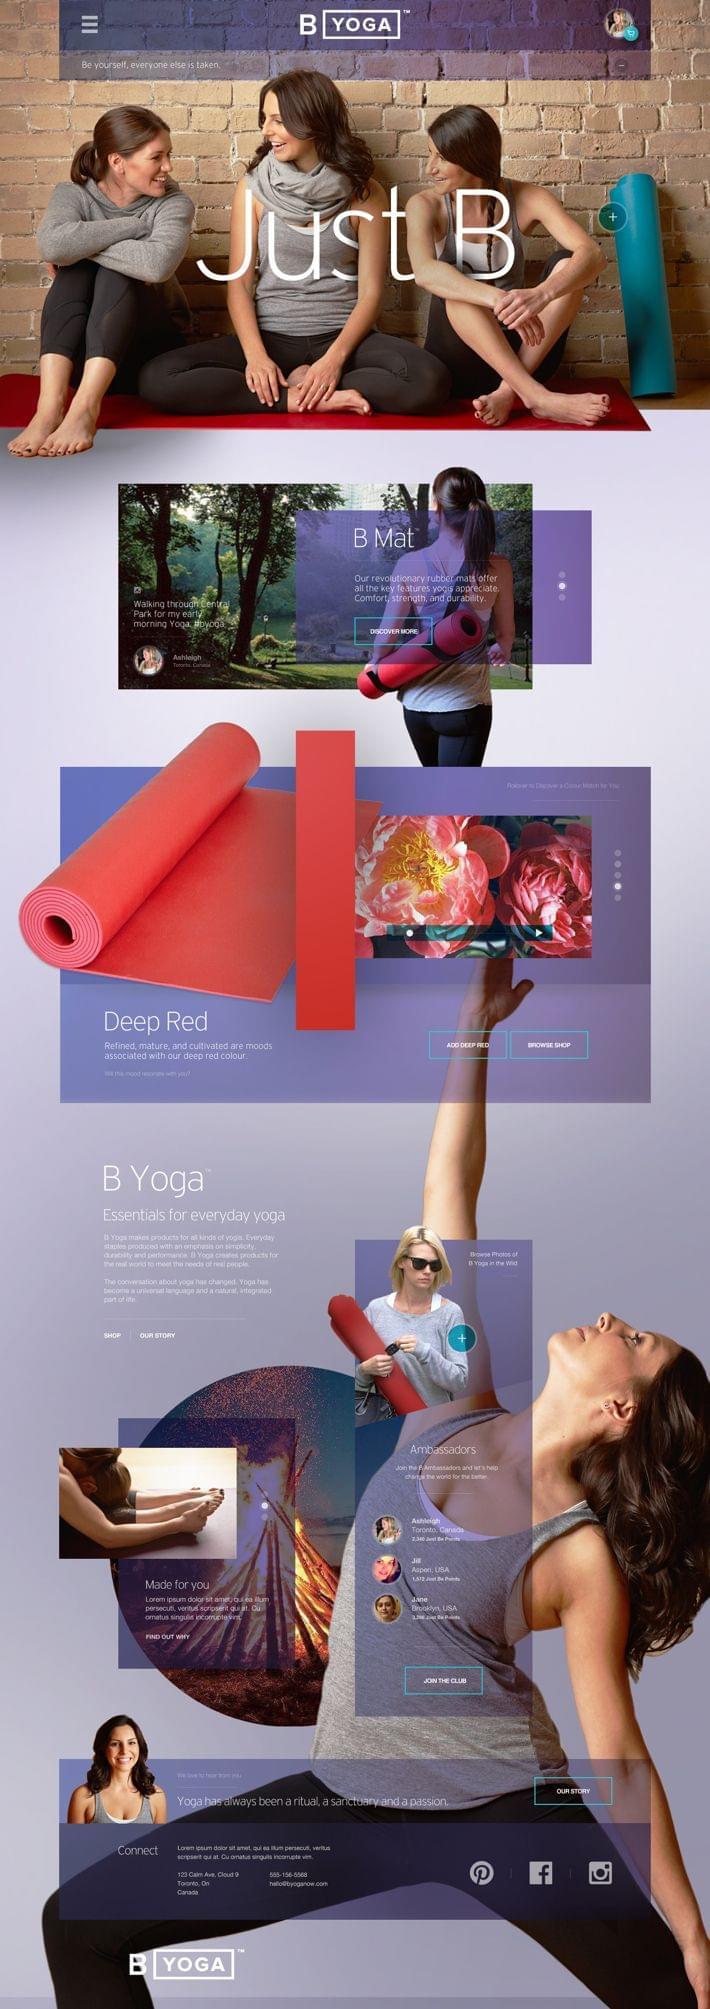 B Yoga Website : Post Launch Revisit v2 by John Speed